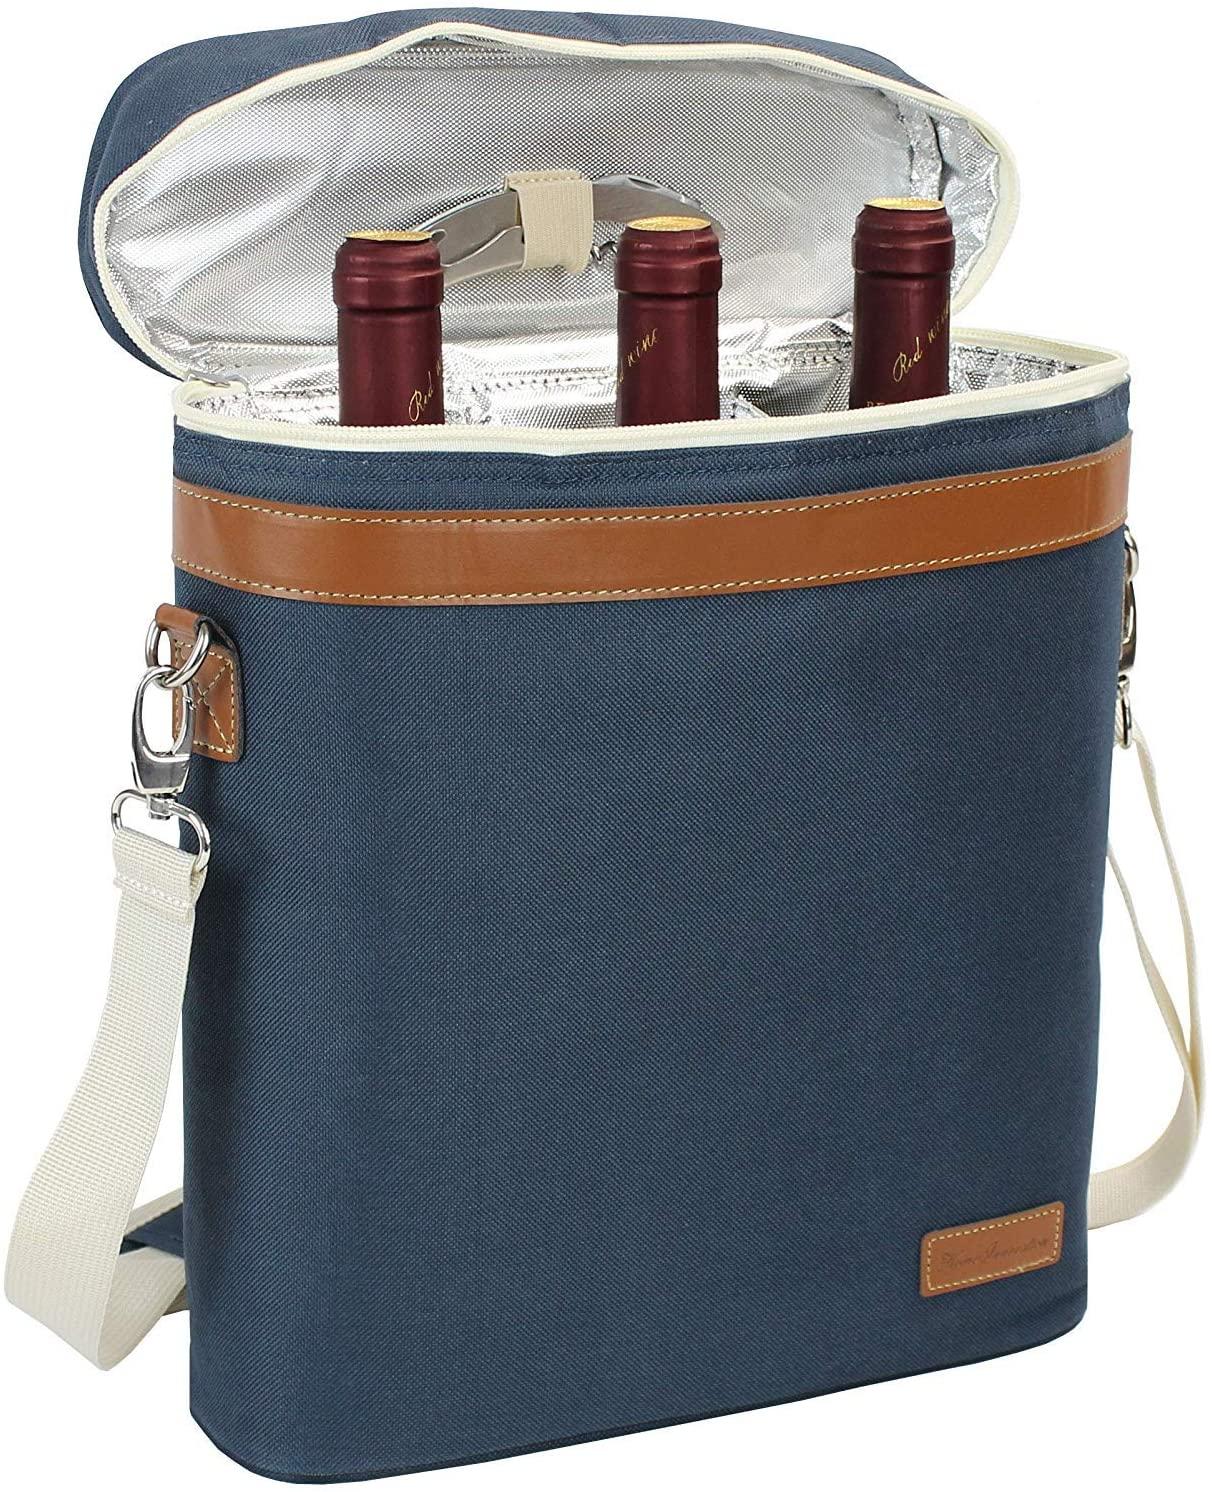 white-elephant-wine-tote-with-corkscrew